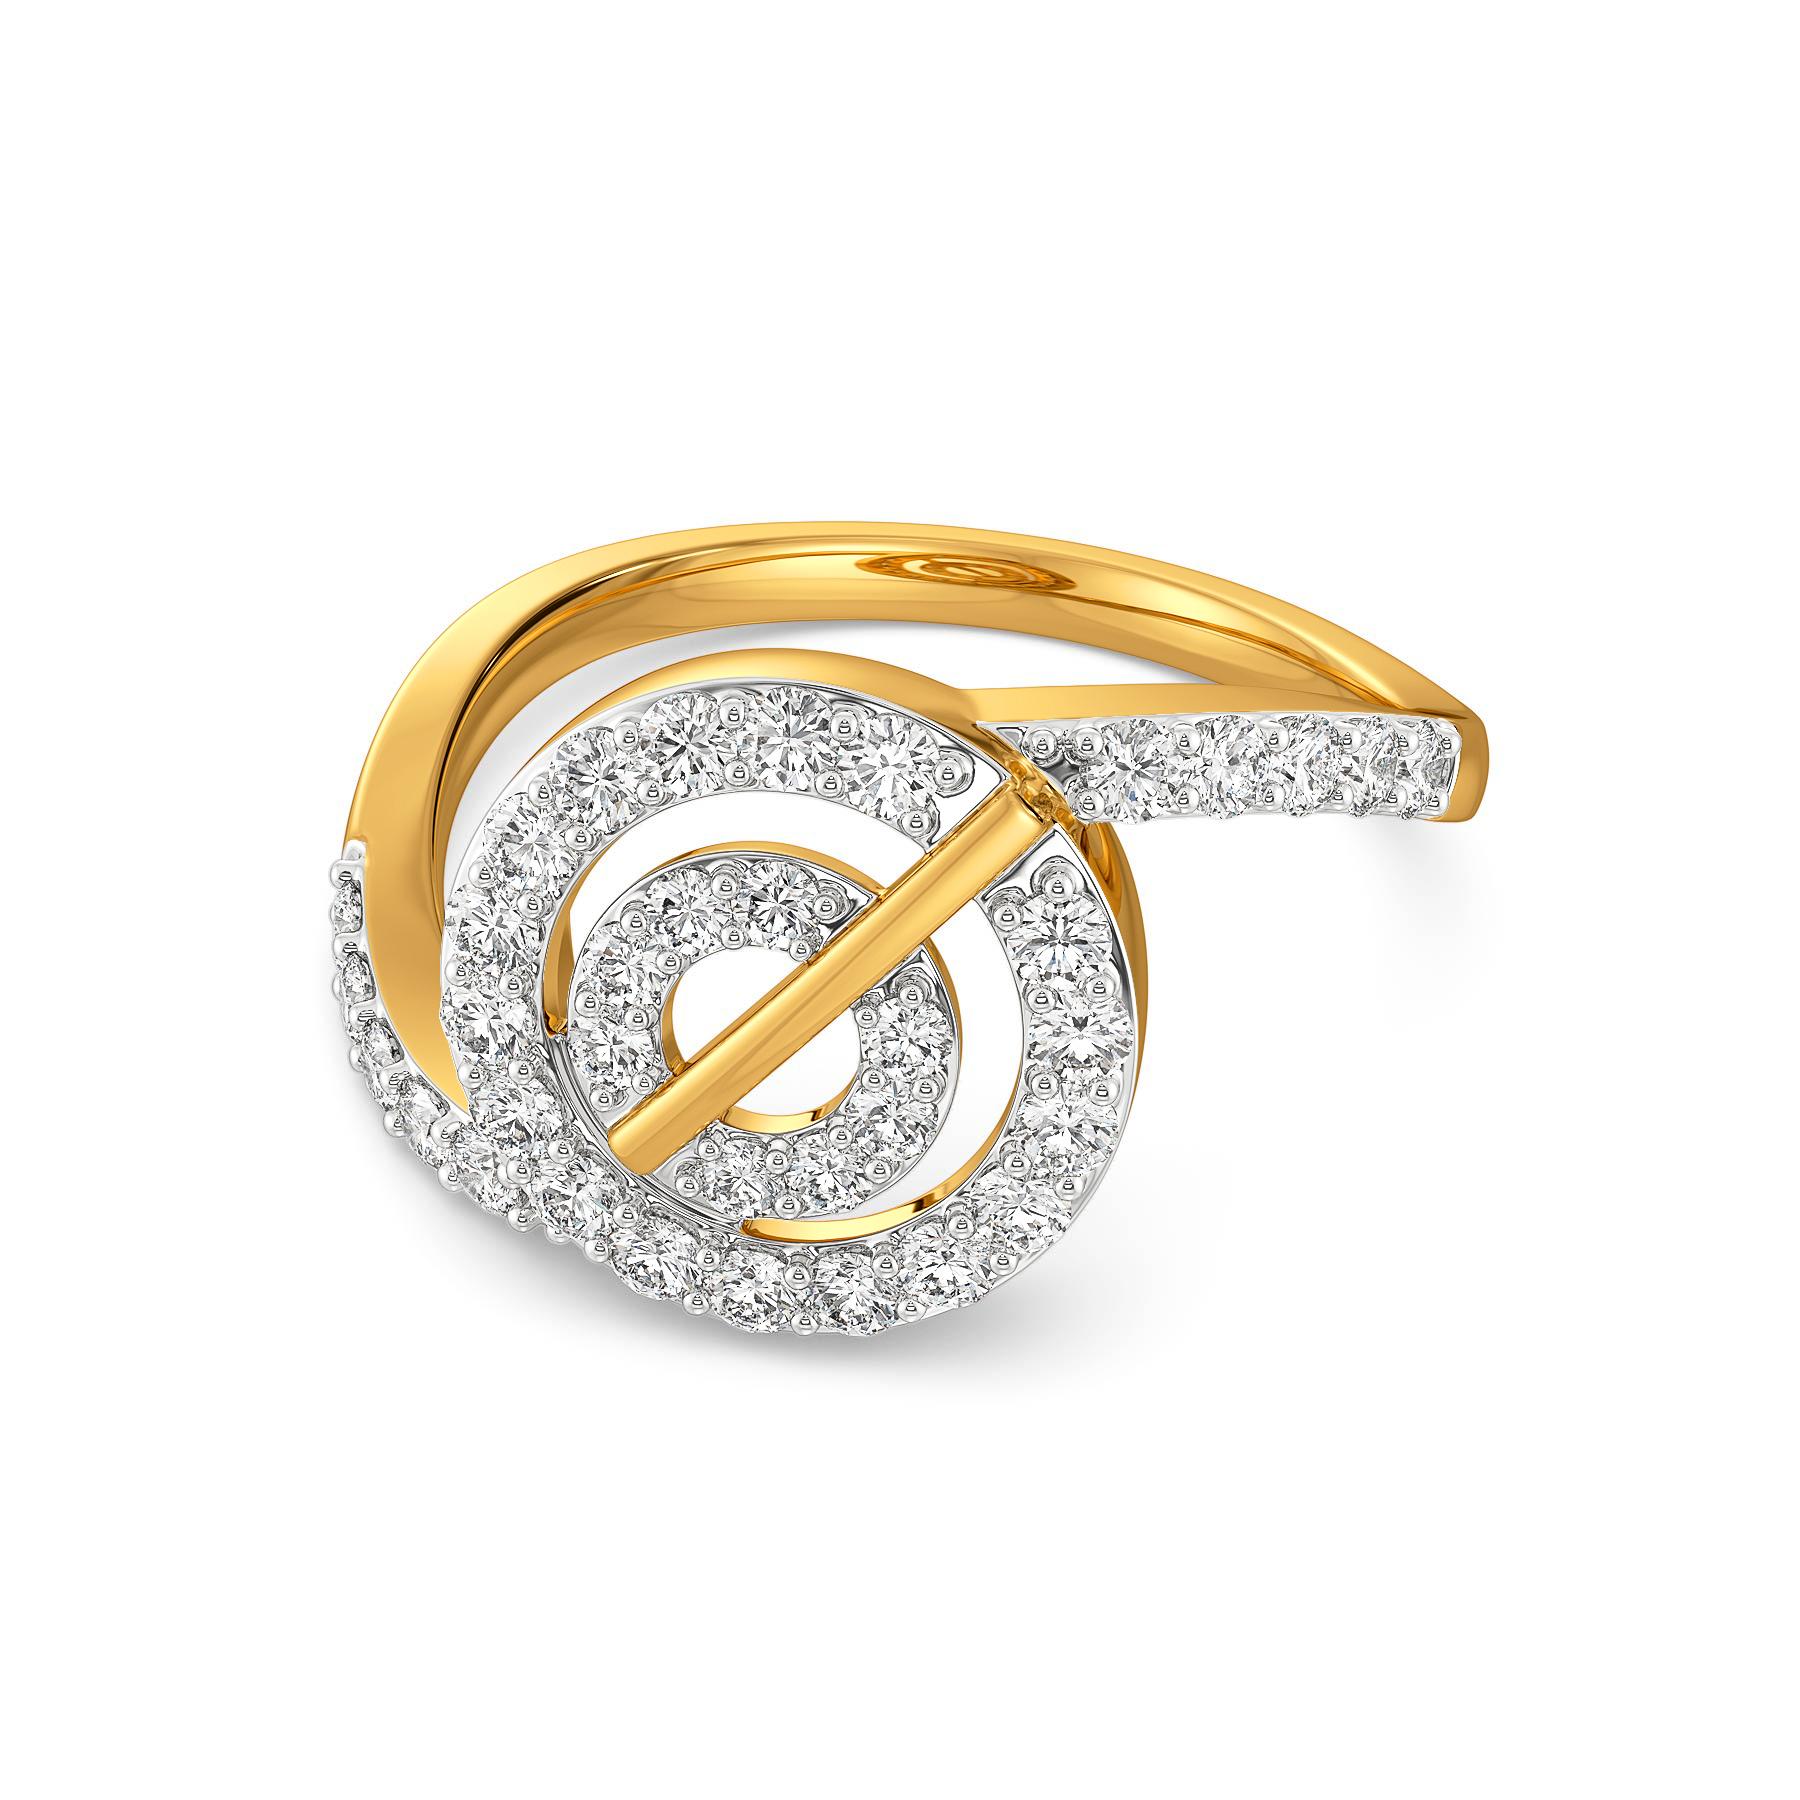 Hula Hoop Habit Diamond Rings